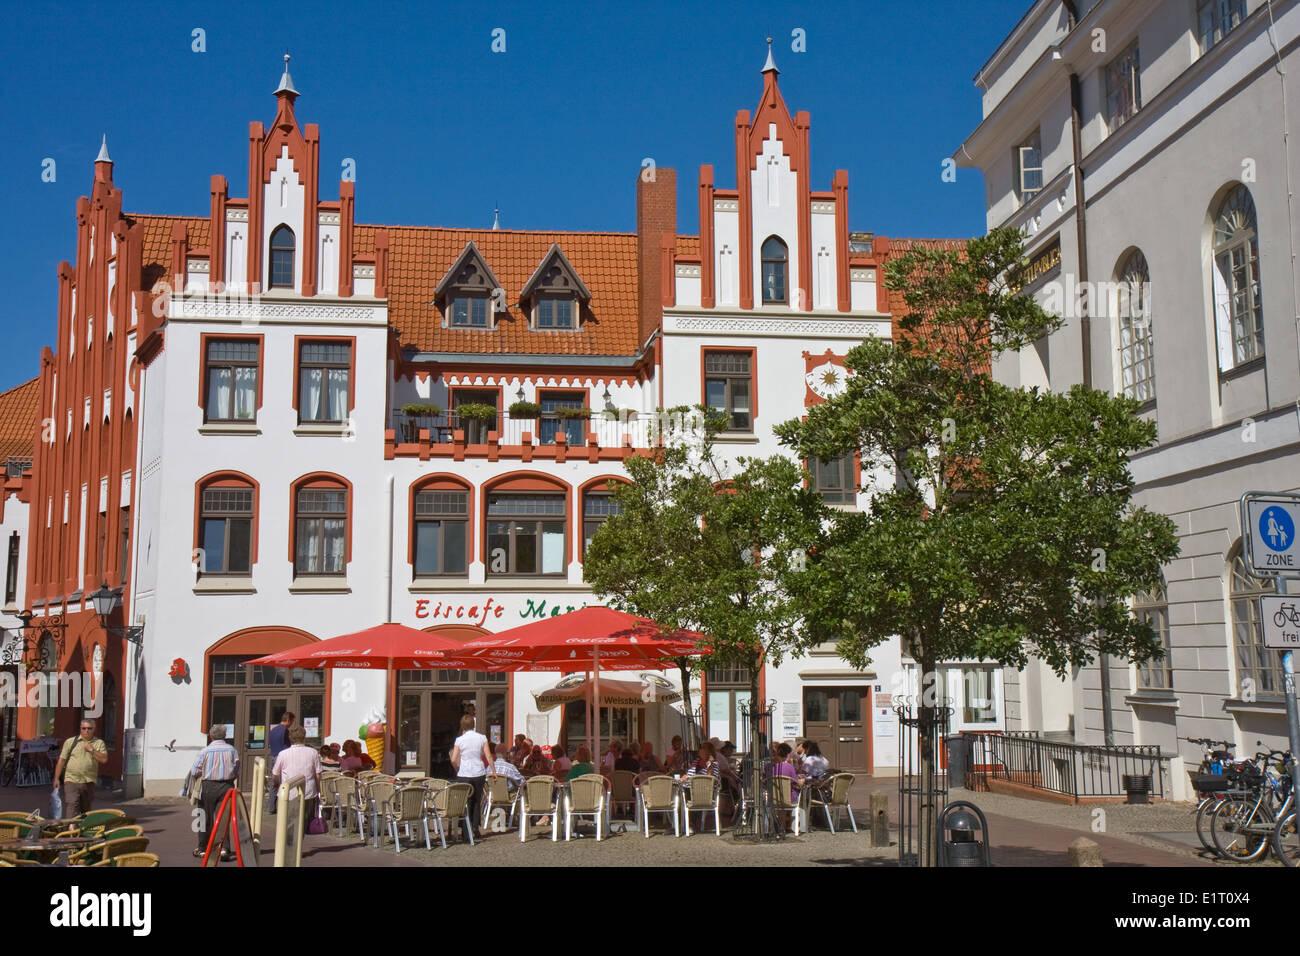 Europa, Deutschland, Mecklenburg-Vorpommern, Wismar, historisches Gebaeude in der Altstadt - Stock Image